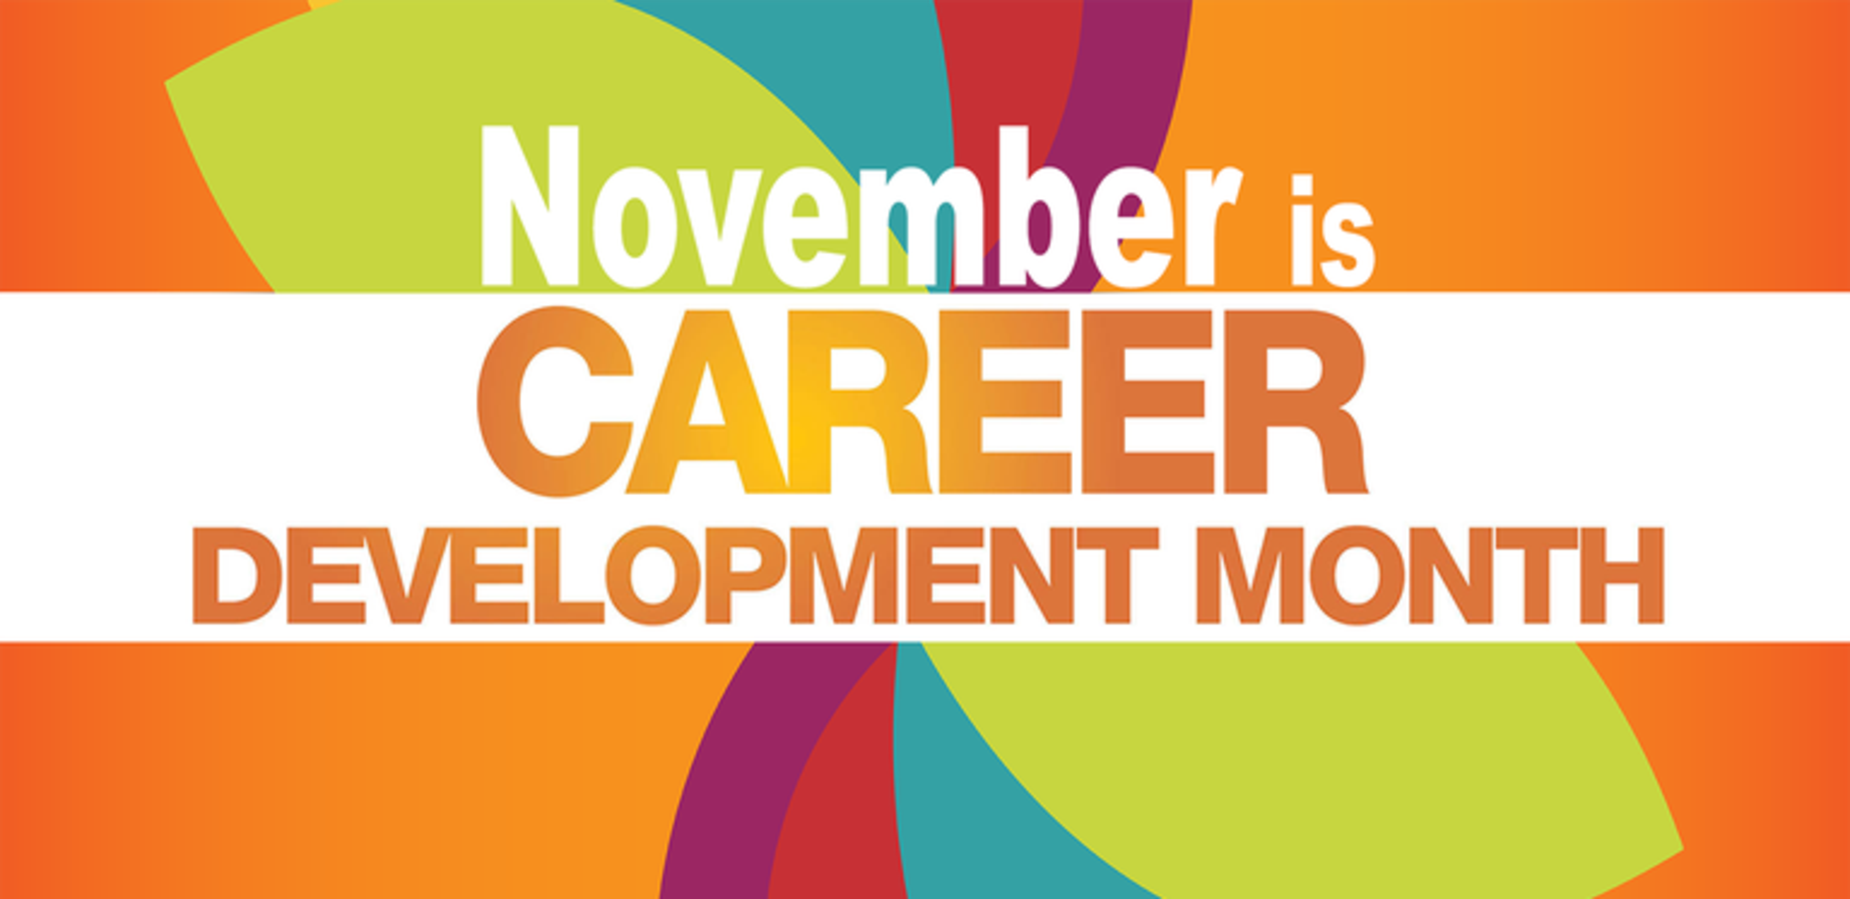 November is Career Development Month